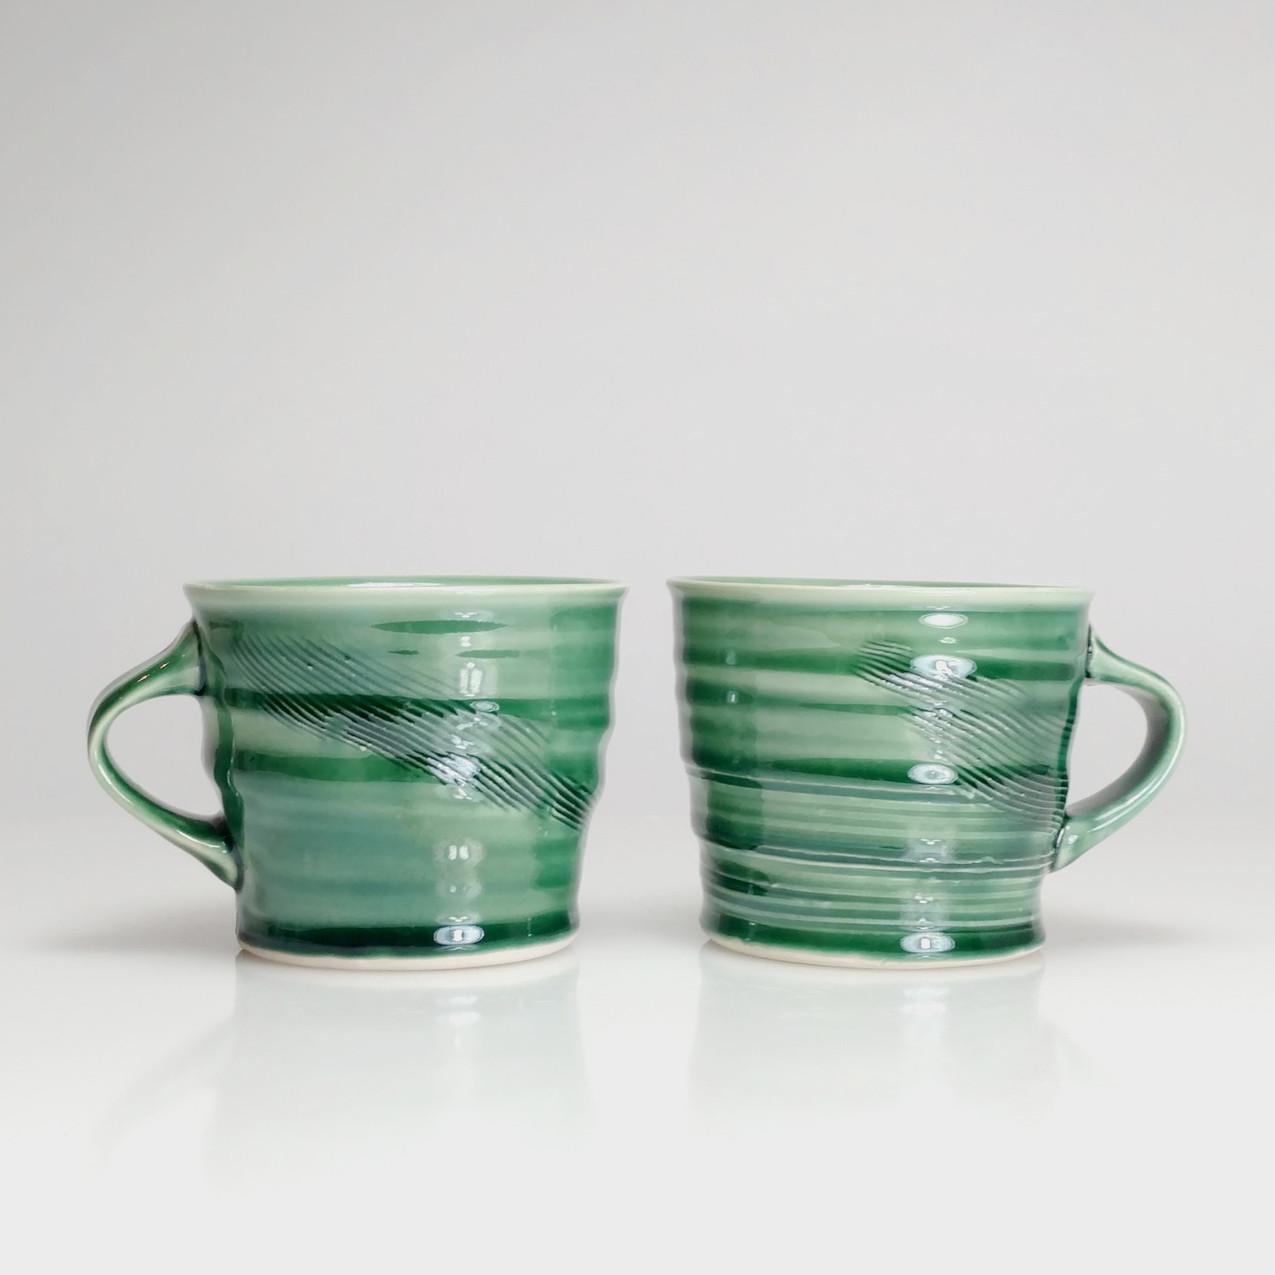 green mugs_edited